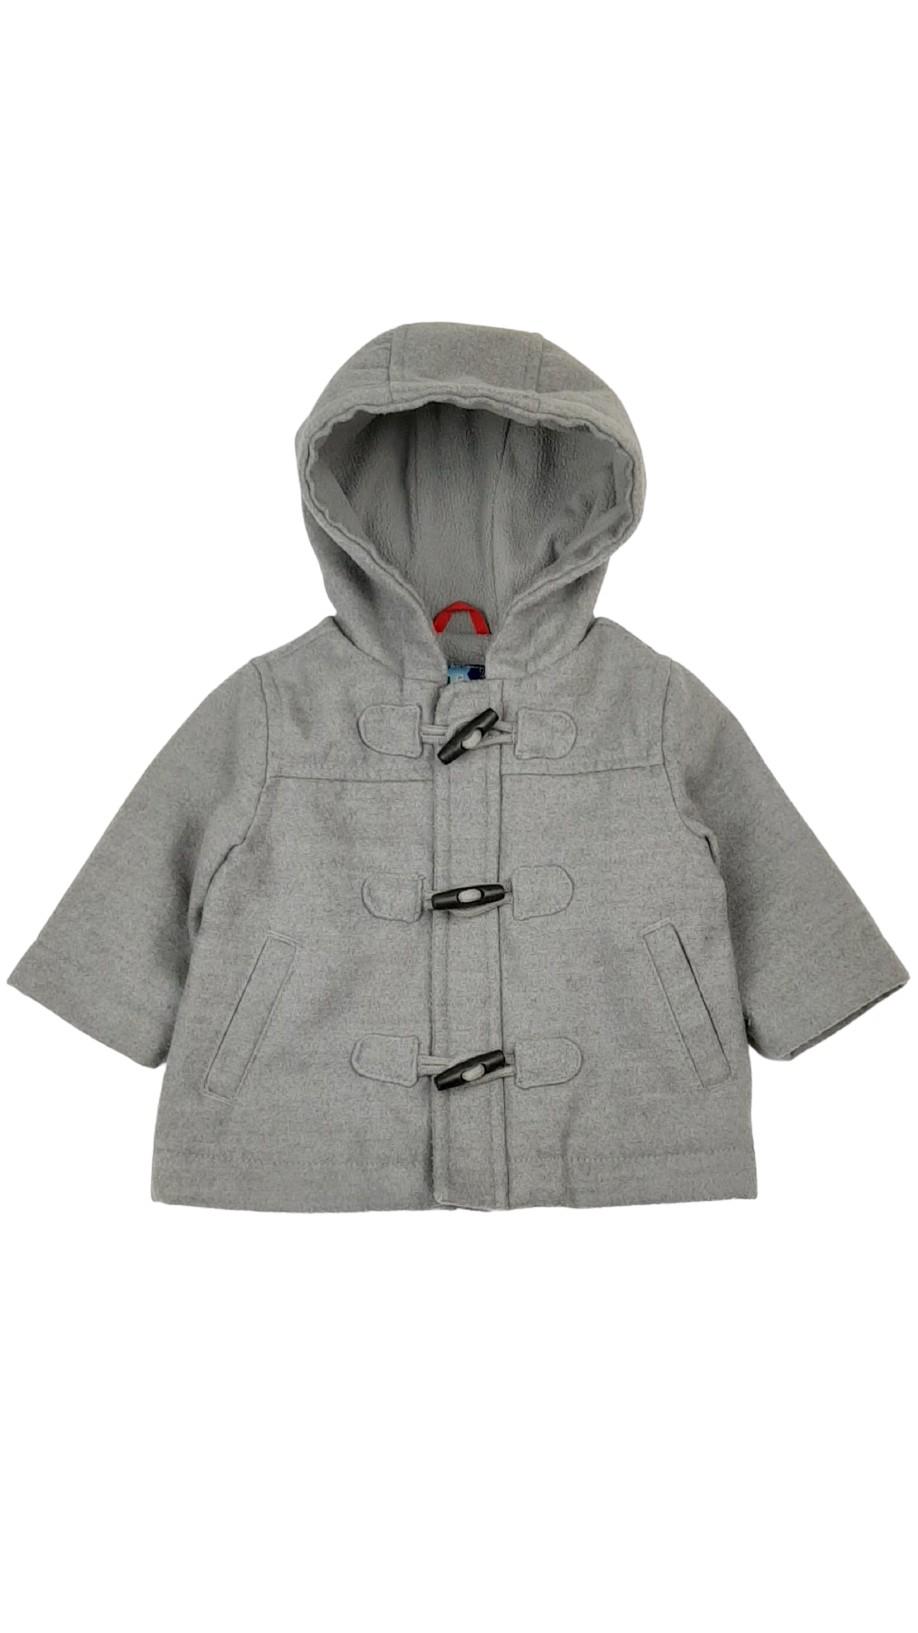 Manteau style duffle coat 1